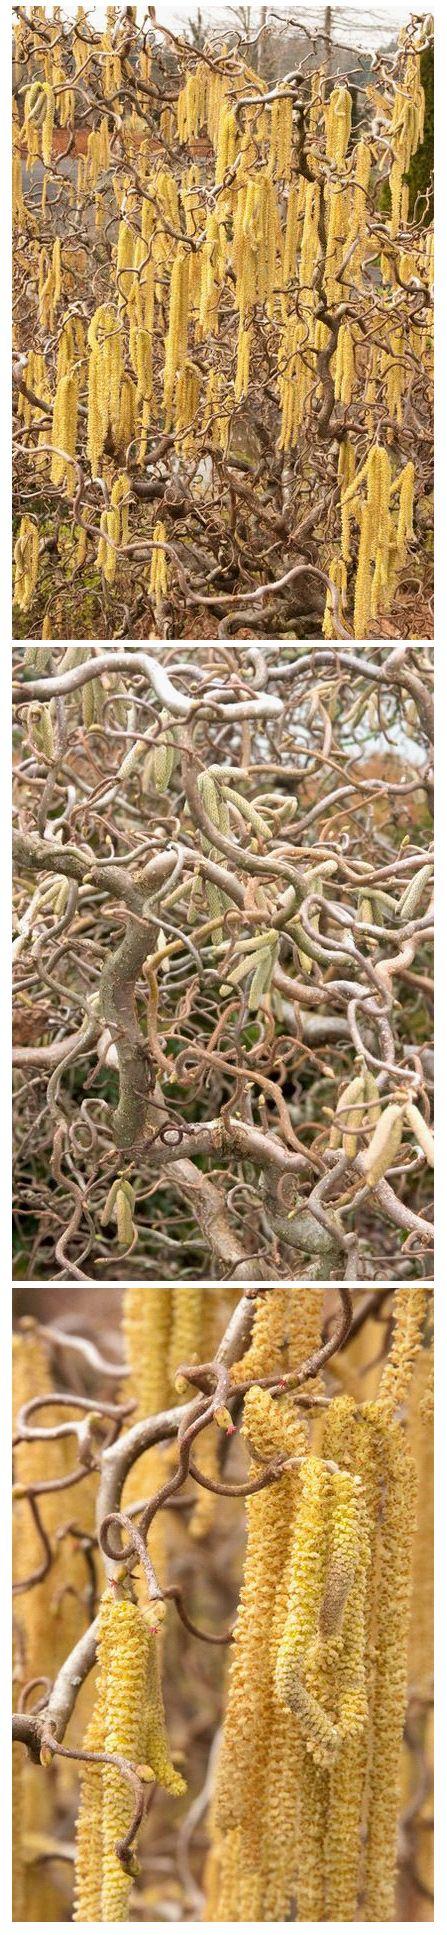 Harry lauder walking stick trees - Harry Lauder S Walking Stick Corylus Avellana Contorta The Twisted Form Of